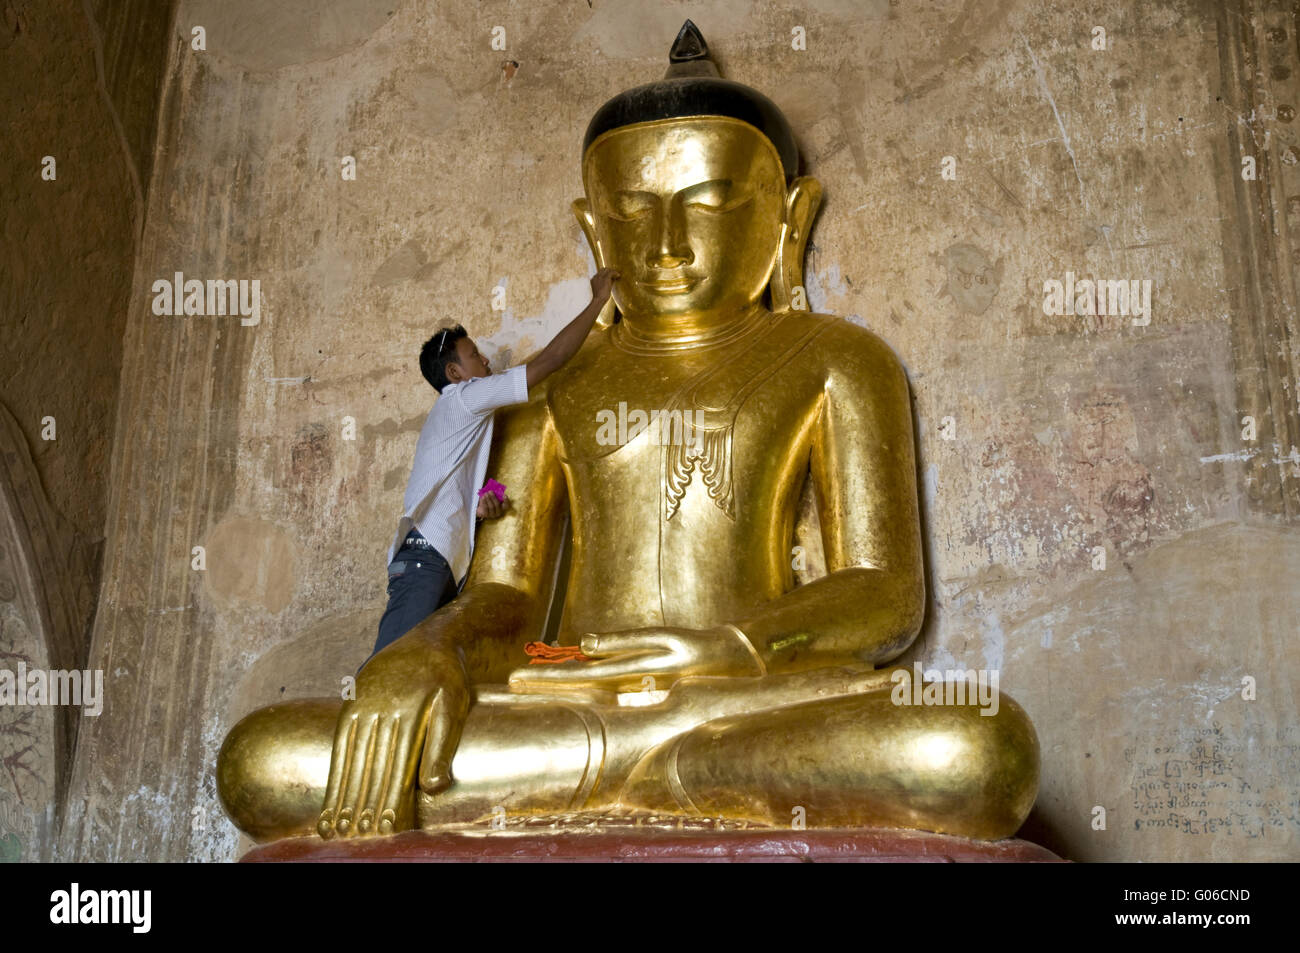 Man applies gold leaf to Buddha image, Burma Stock Photo